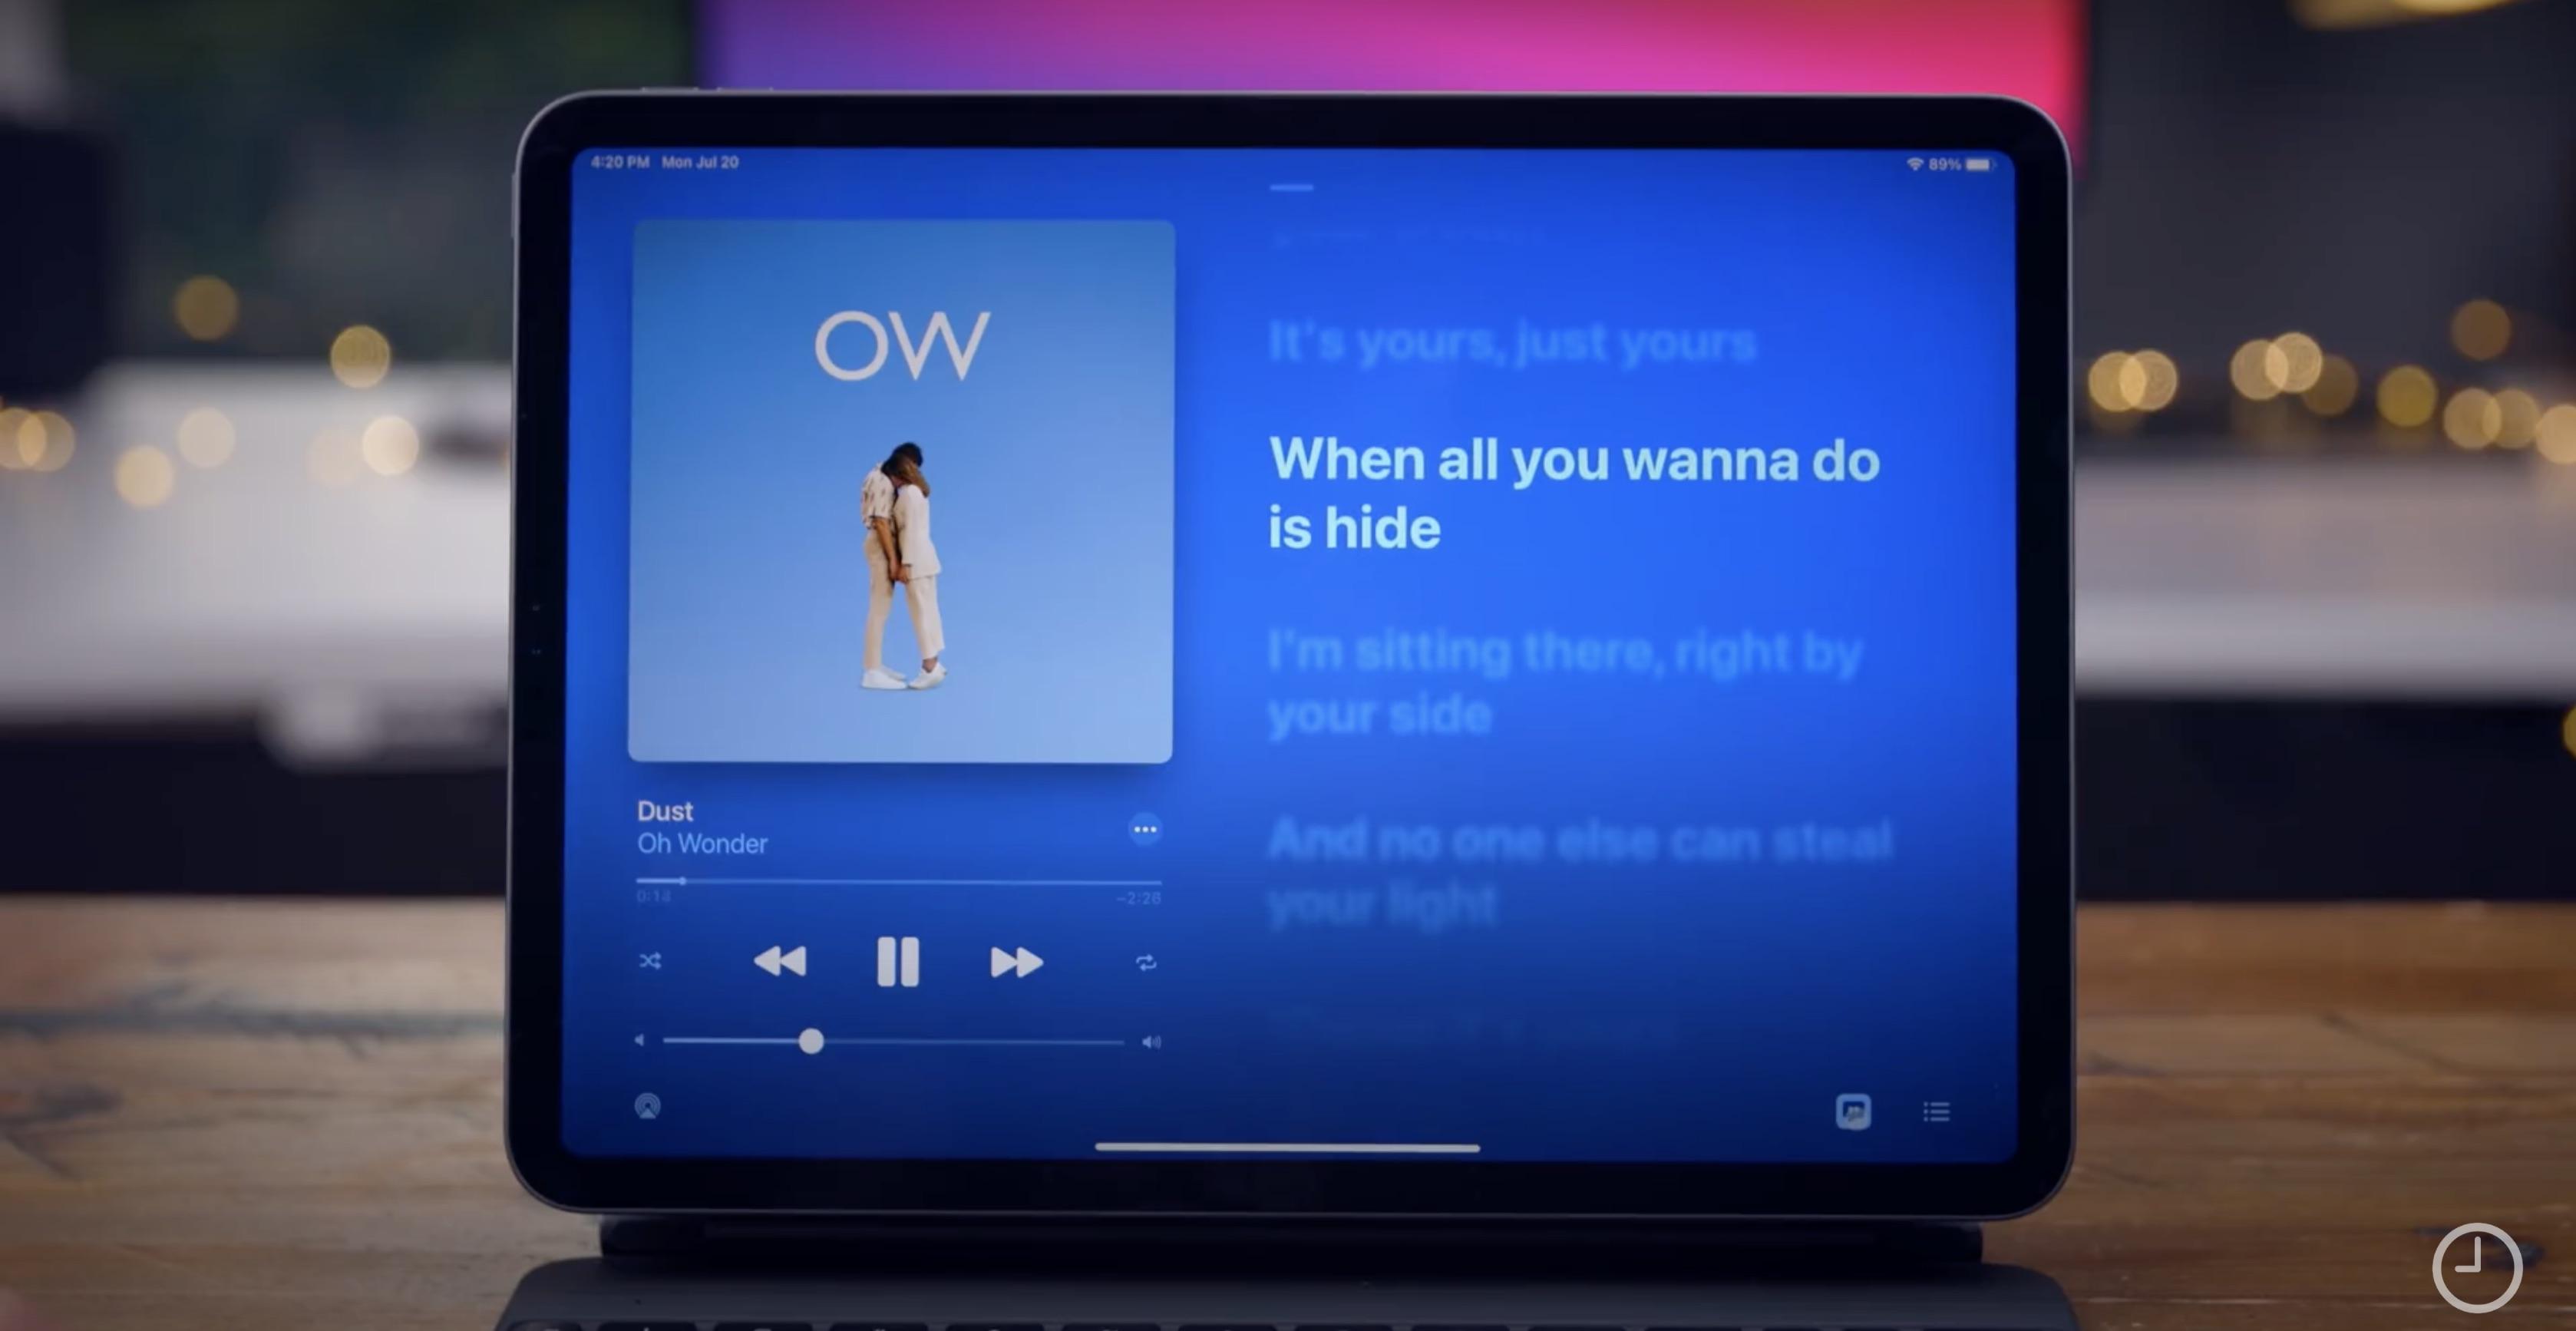 How to use fullscreen live lyrics on iPad in iOS 14 - 9to5Mac